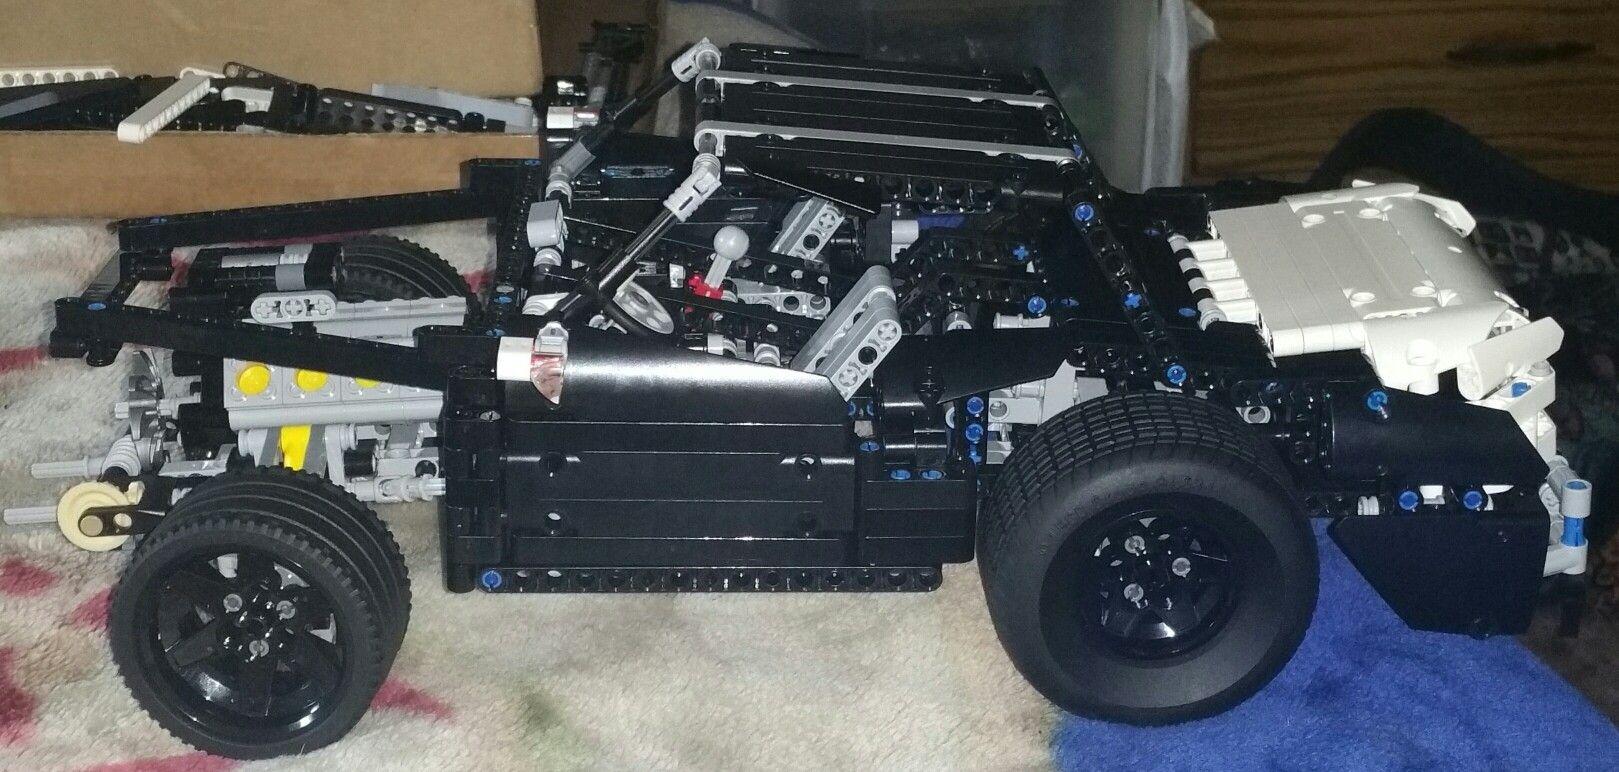 Pin on LEGO TECHNIC CARS,TRUCKS,SUVS